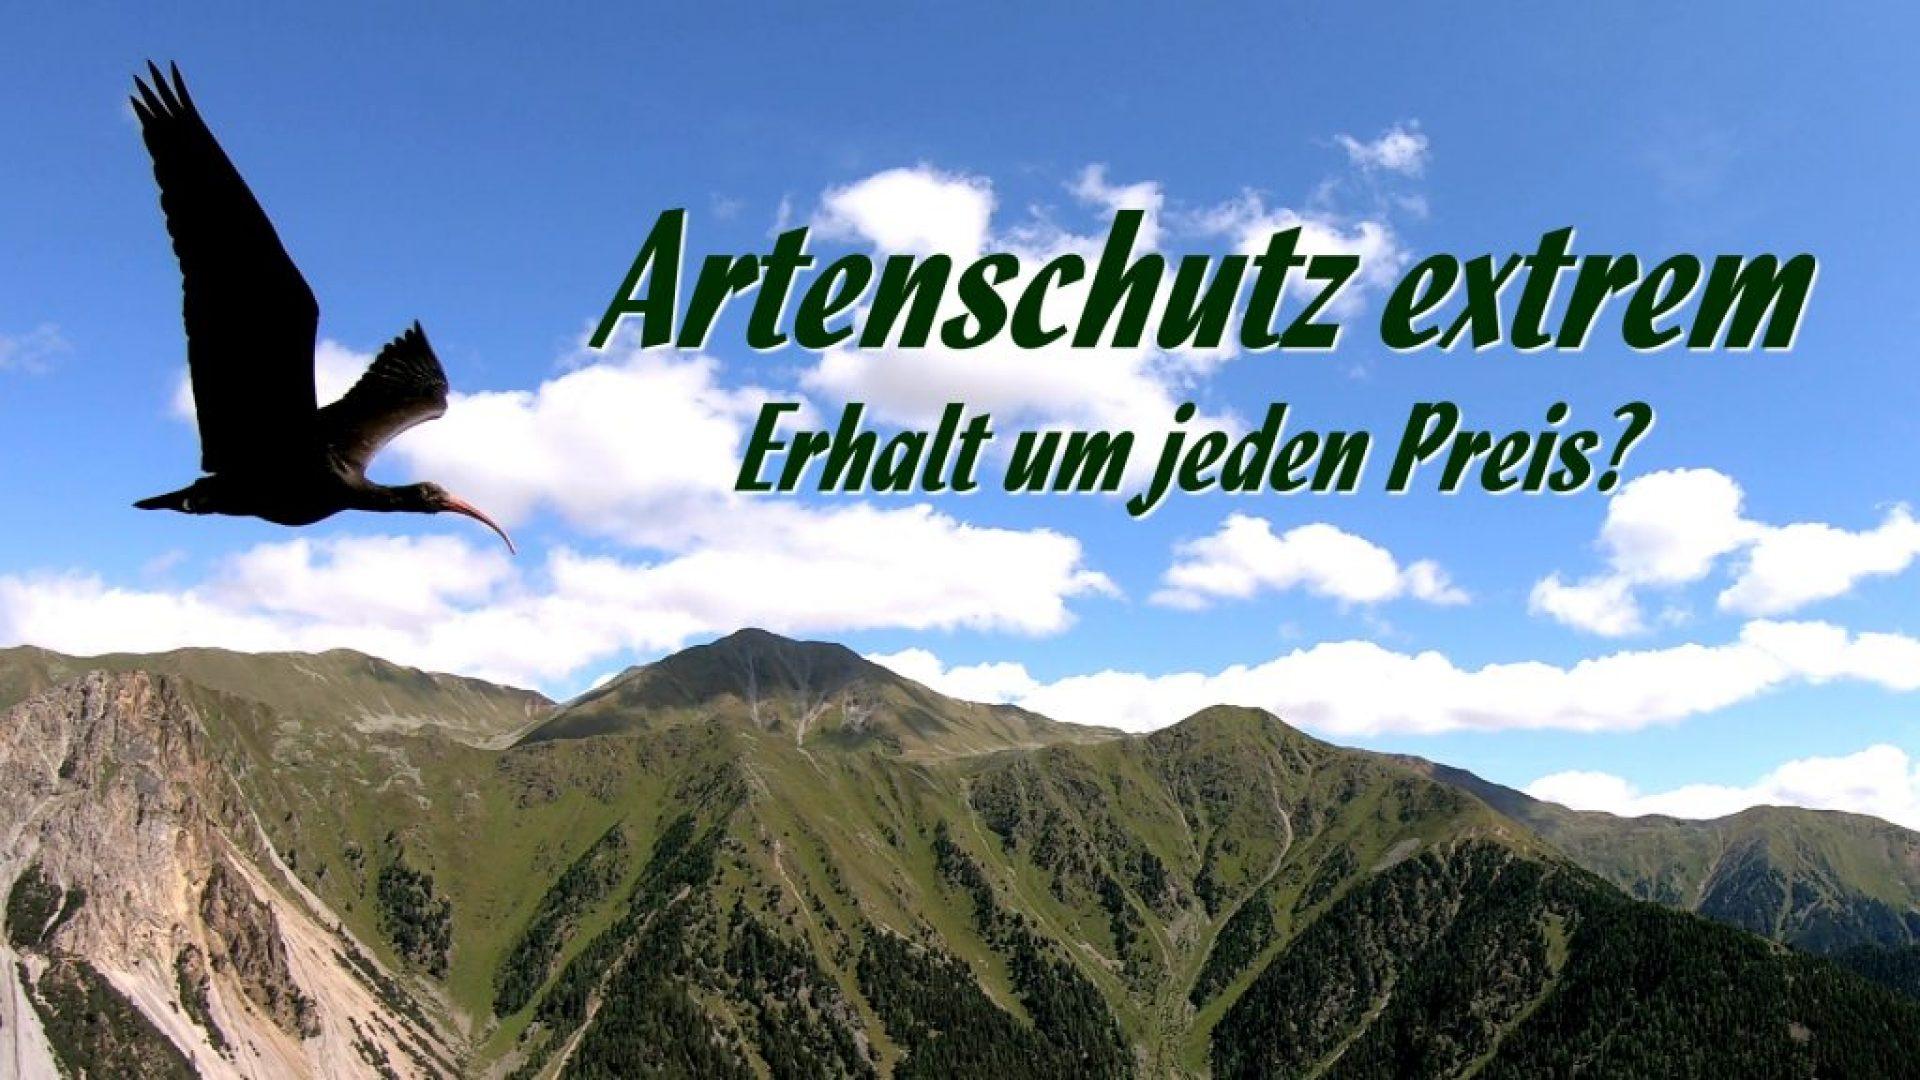 Wildlife conservation extreme